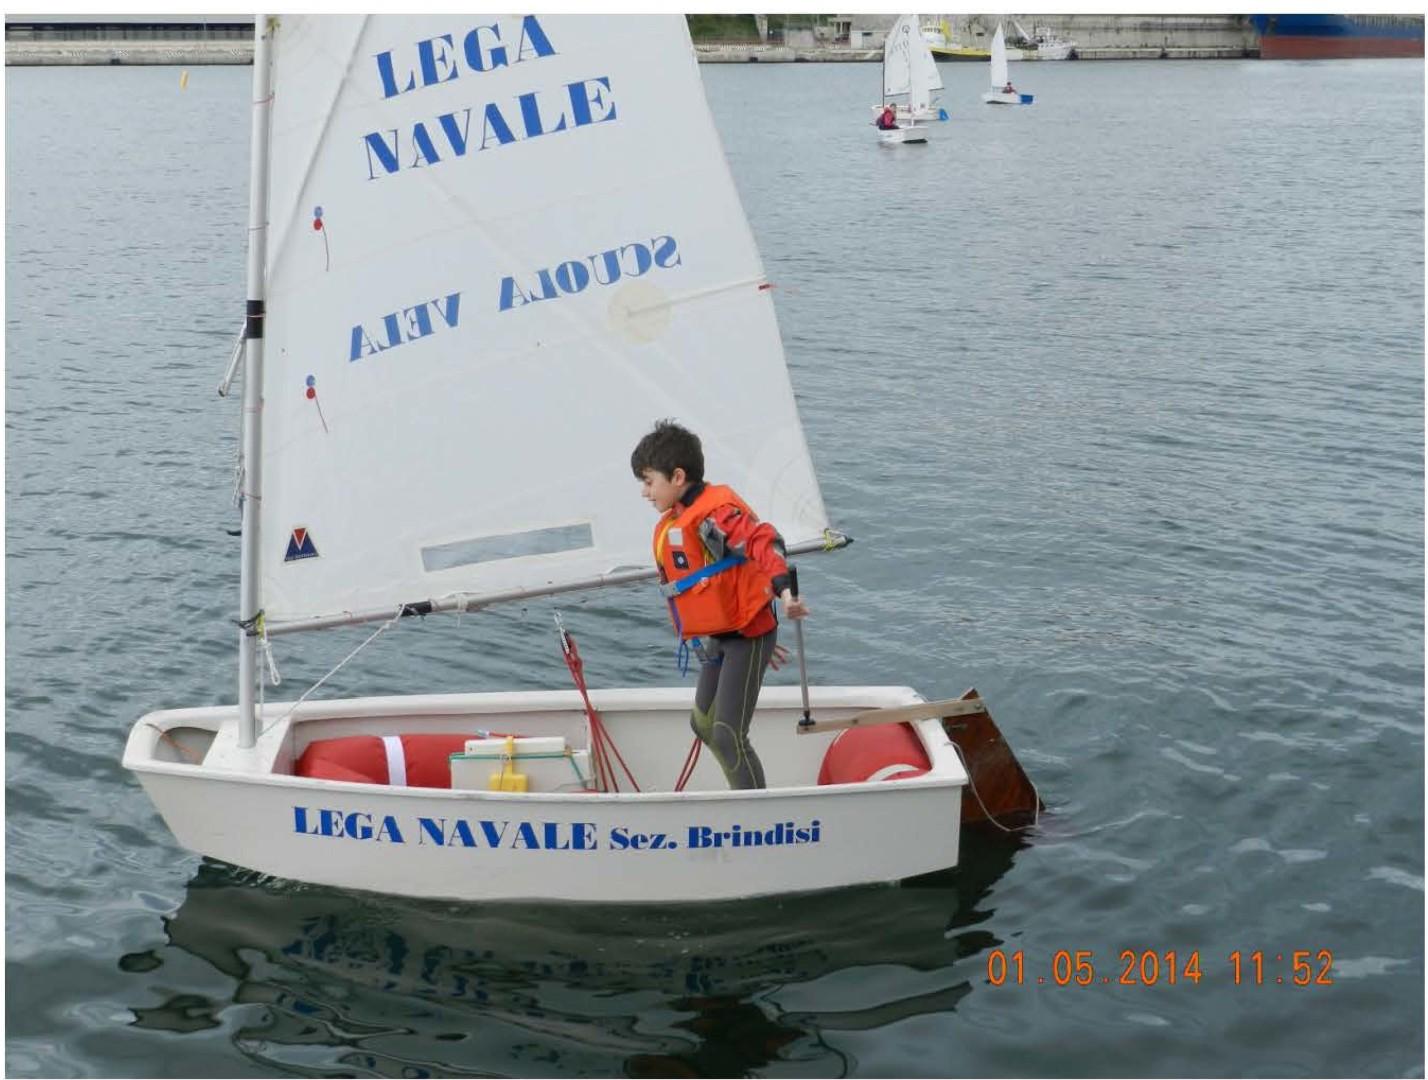 Lega Navale Italiana Brindisi Gruppo Sportivo Vela 6